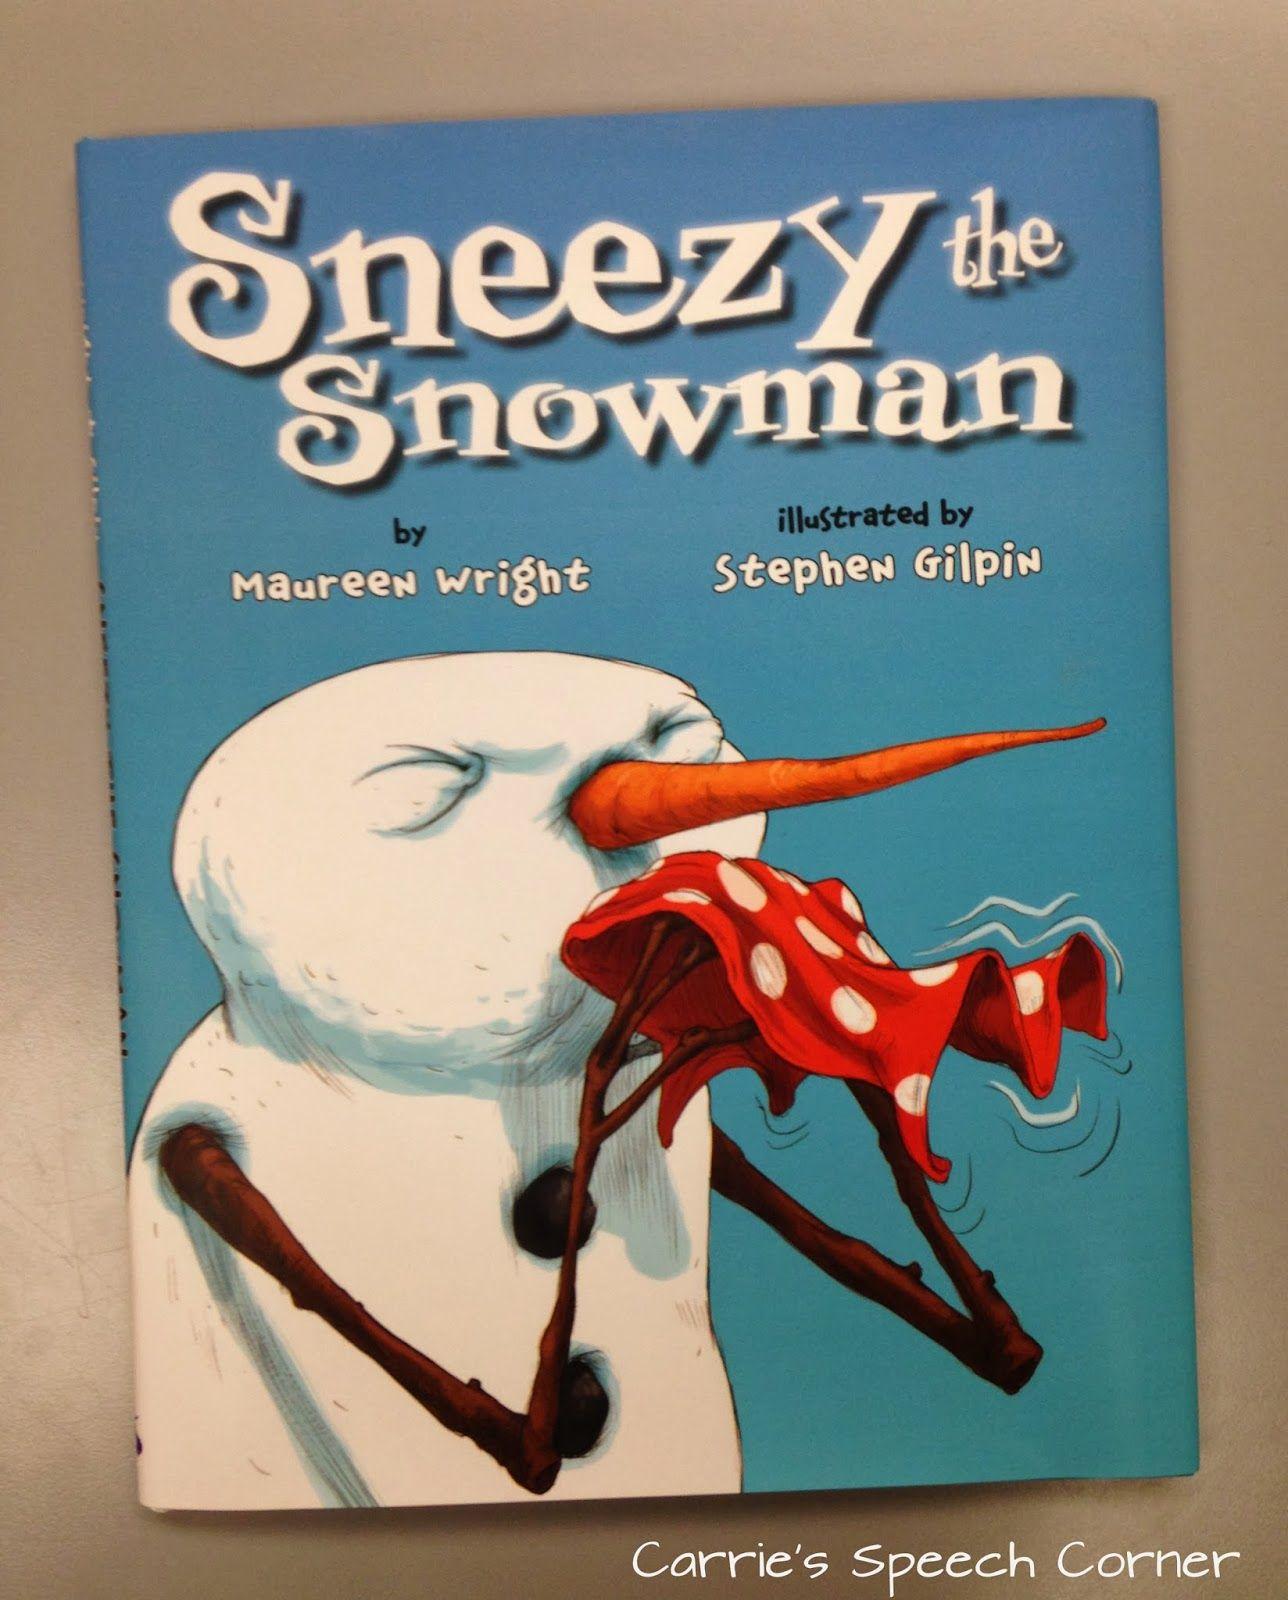 Carrie S Speech Corner Book Of The Week Sneezy The Snowman